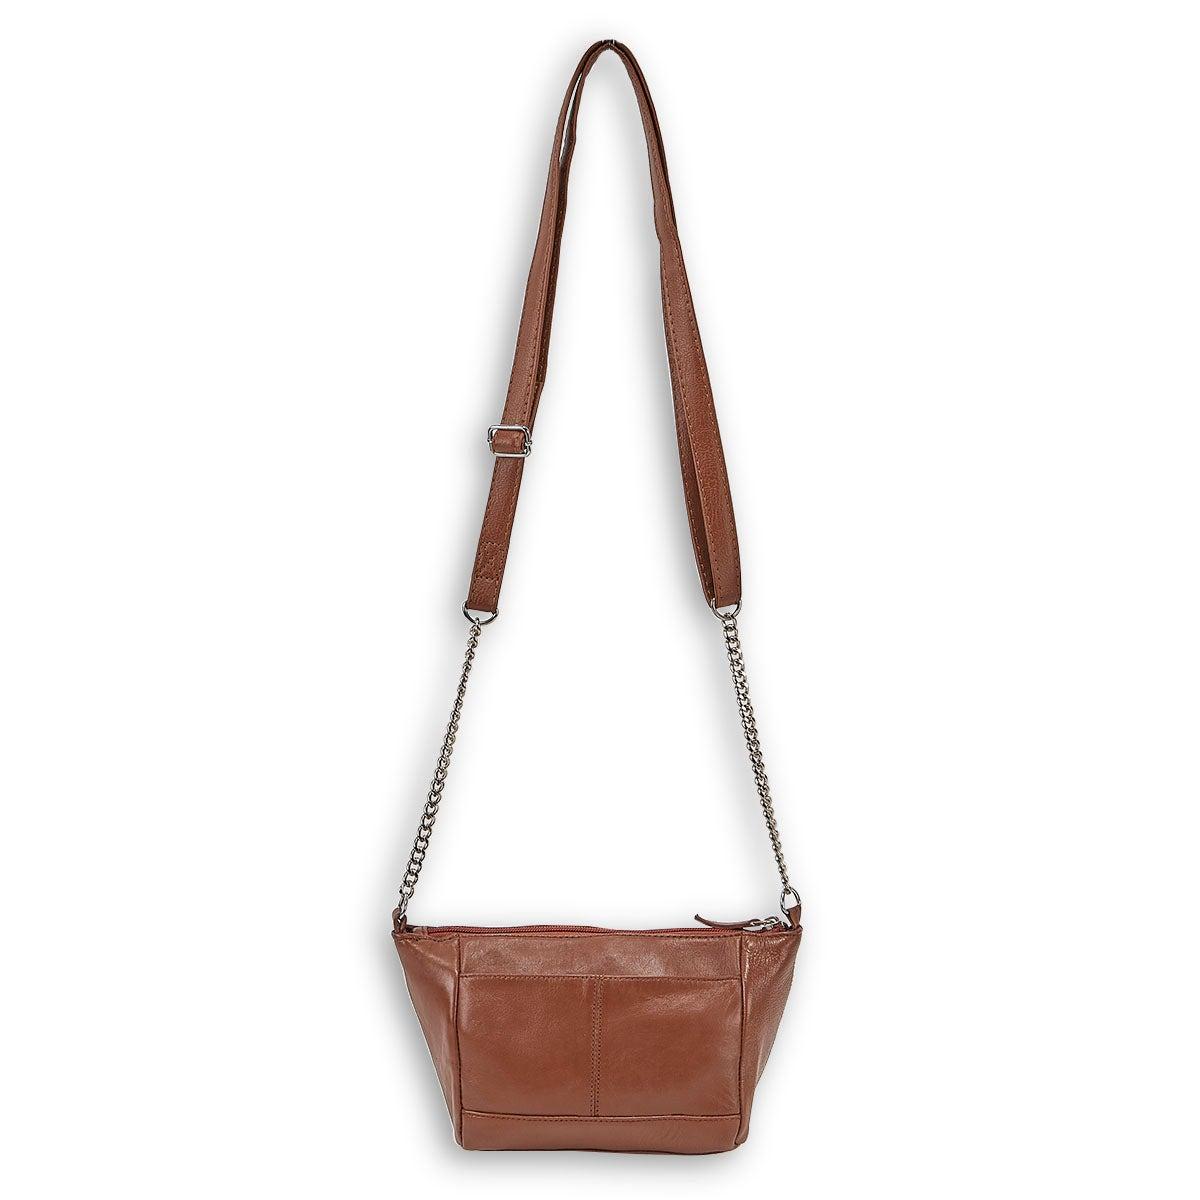 Lds tan sheep leather crossbody bag